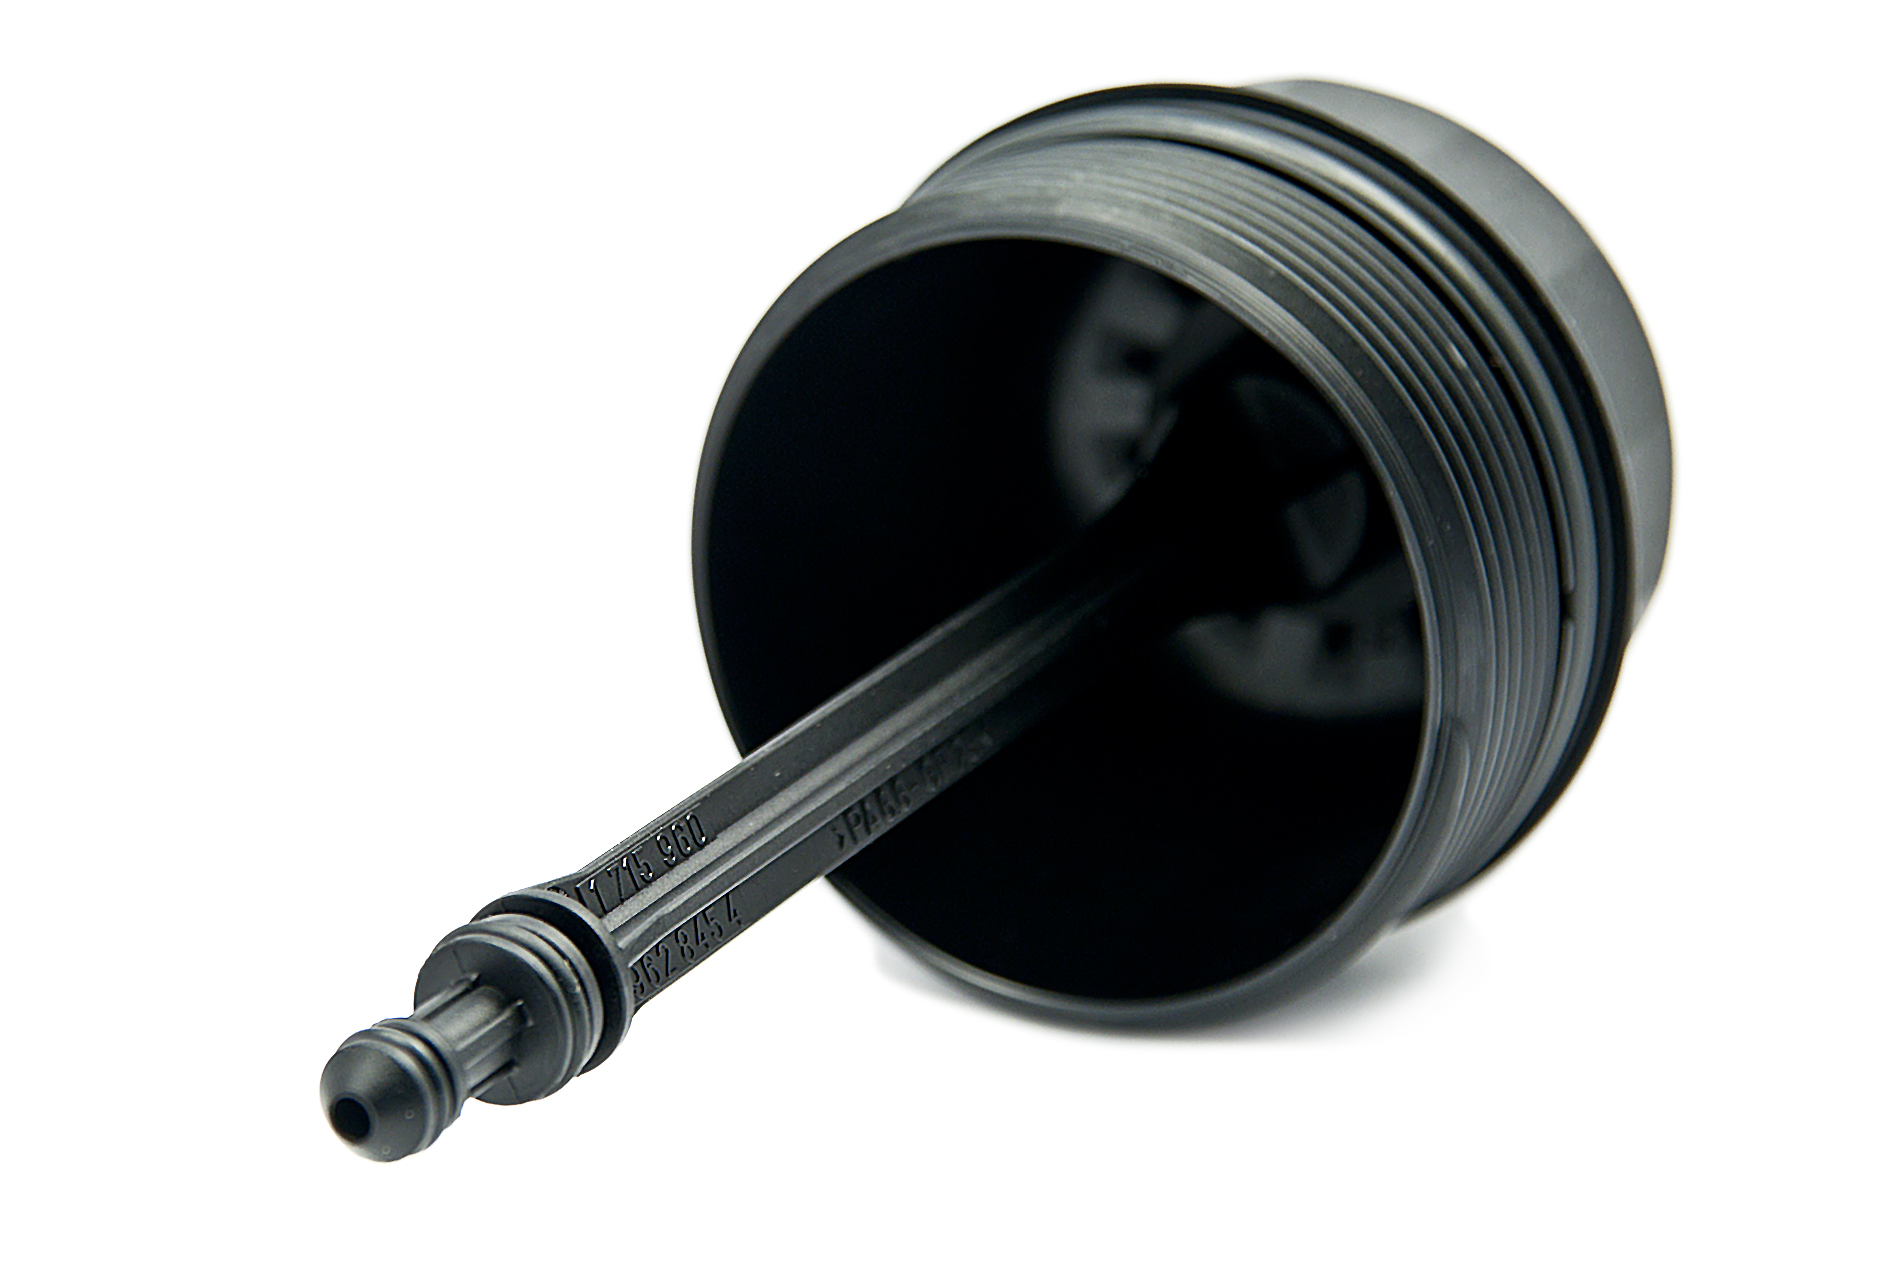 Bmw Genuine Oil Filter Cover E36 E46 Z3 3 Series